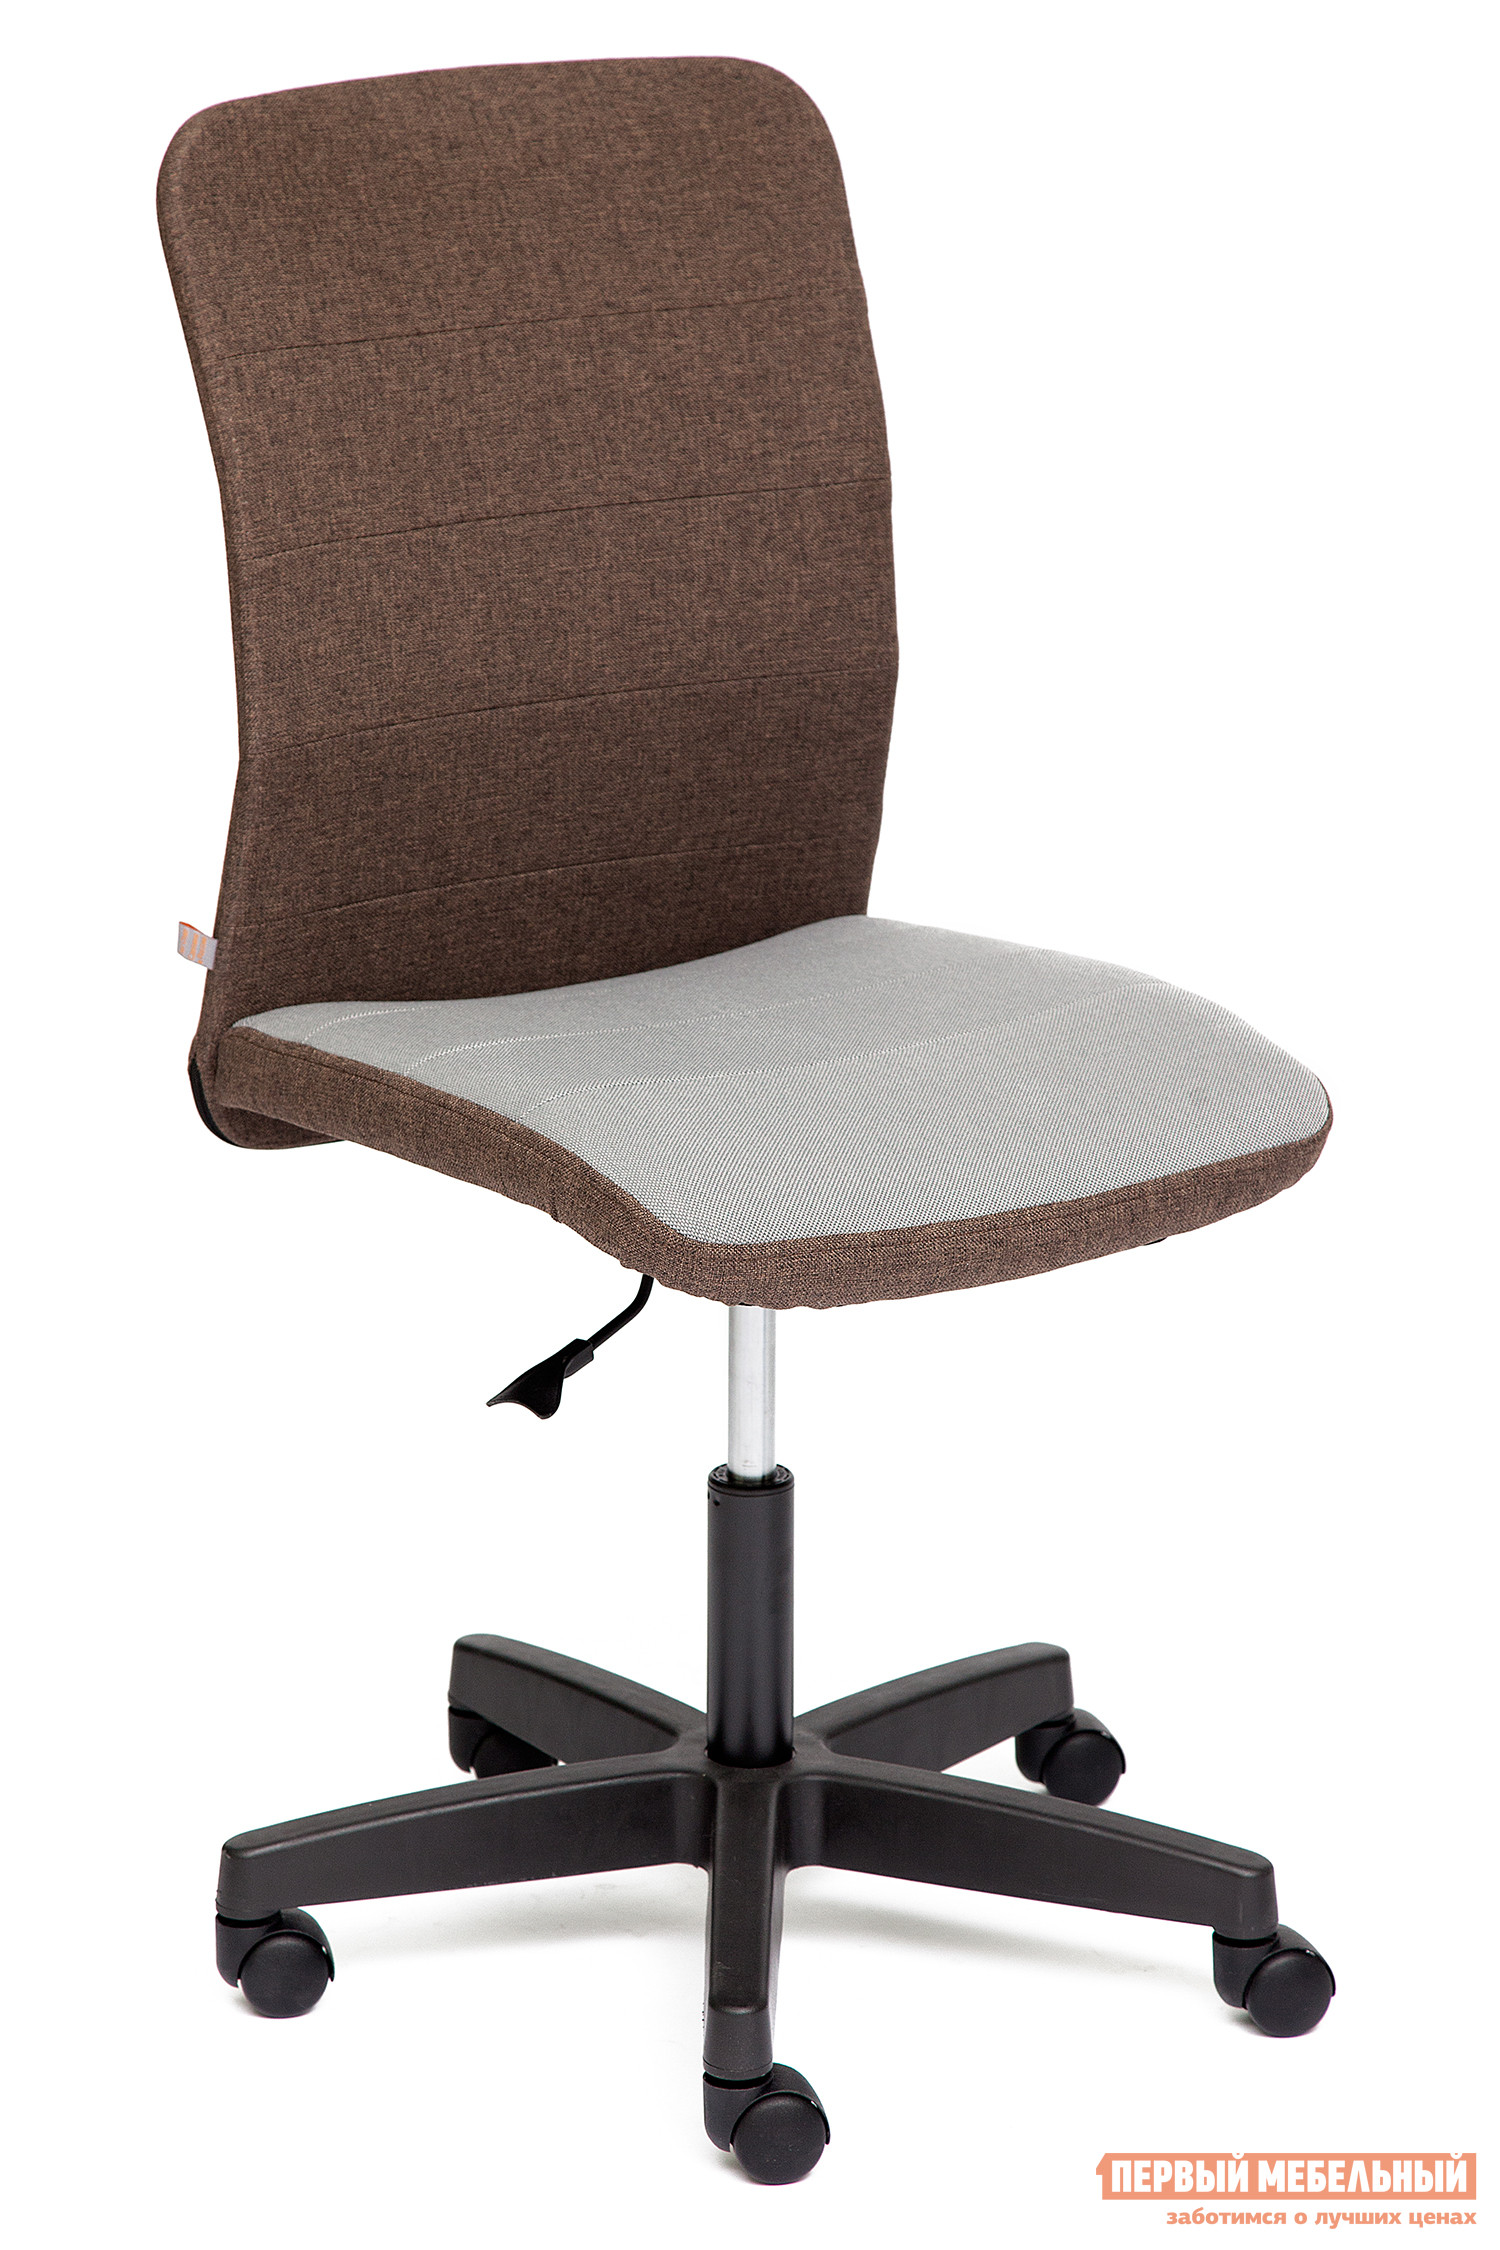 Офисное кресло Tetchair BESTO офисное кресло tetchair besto